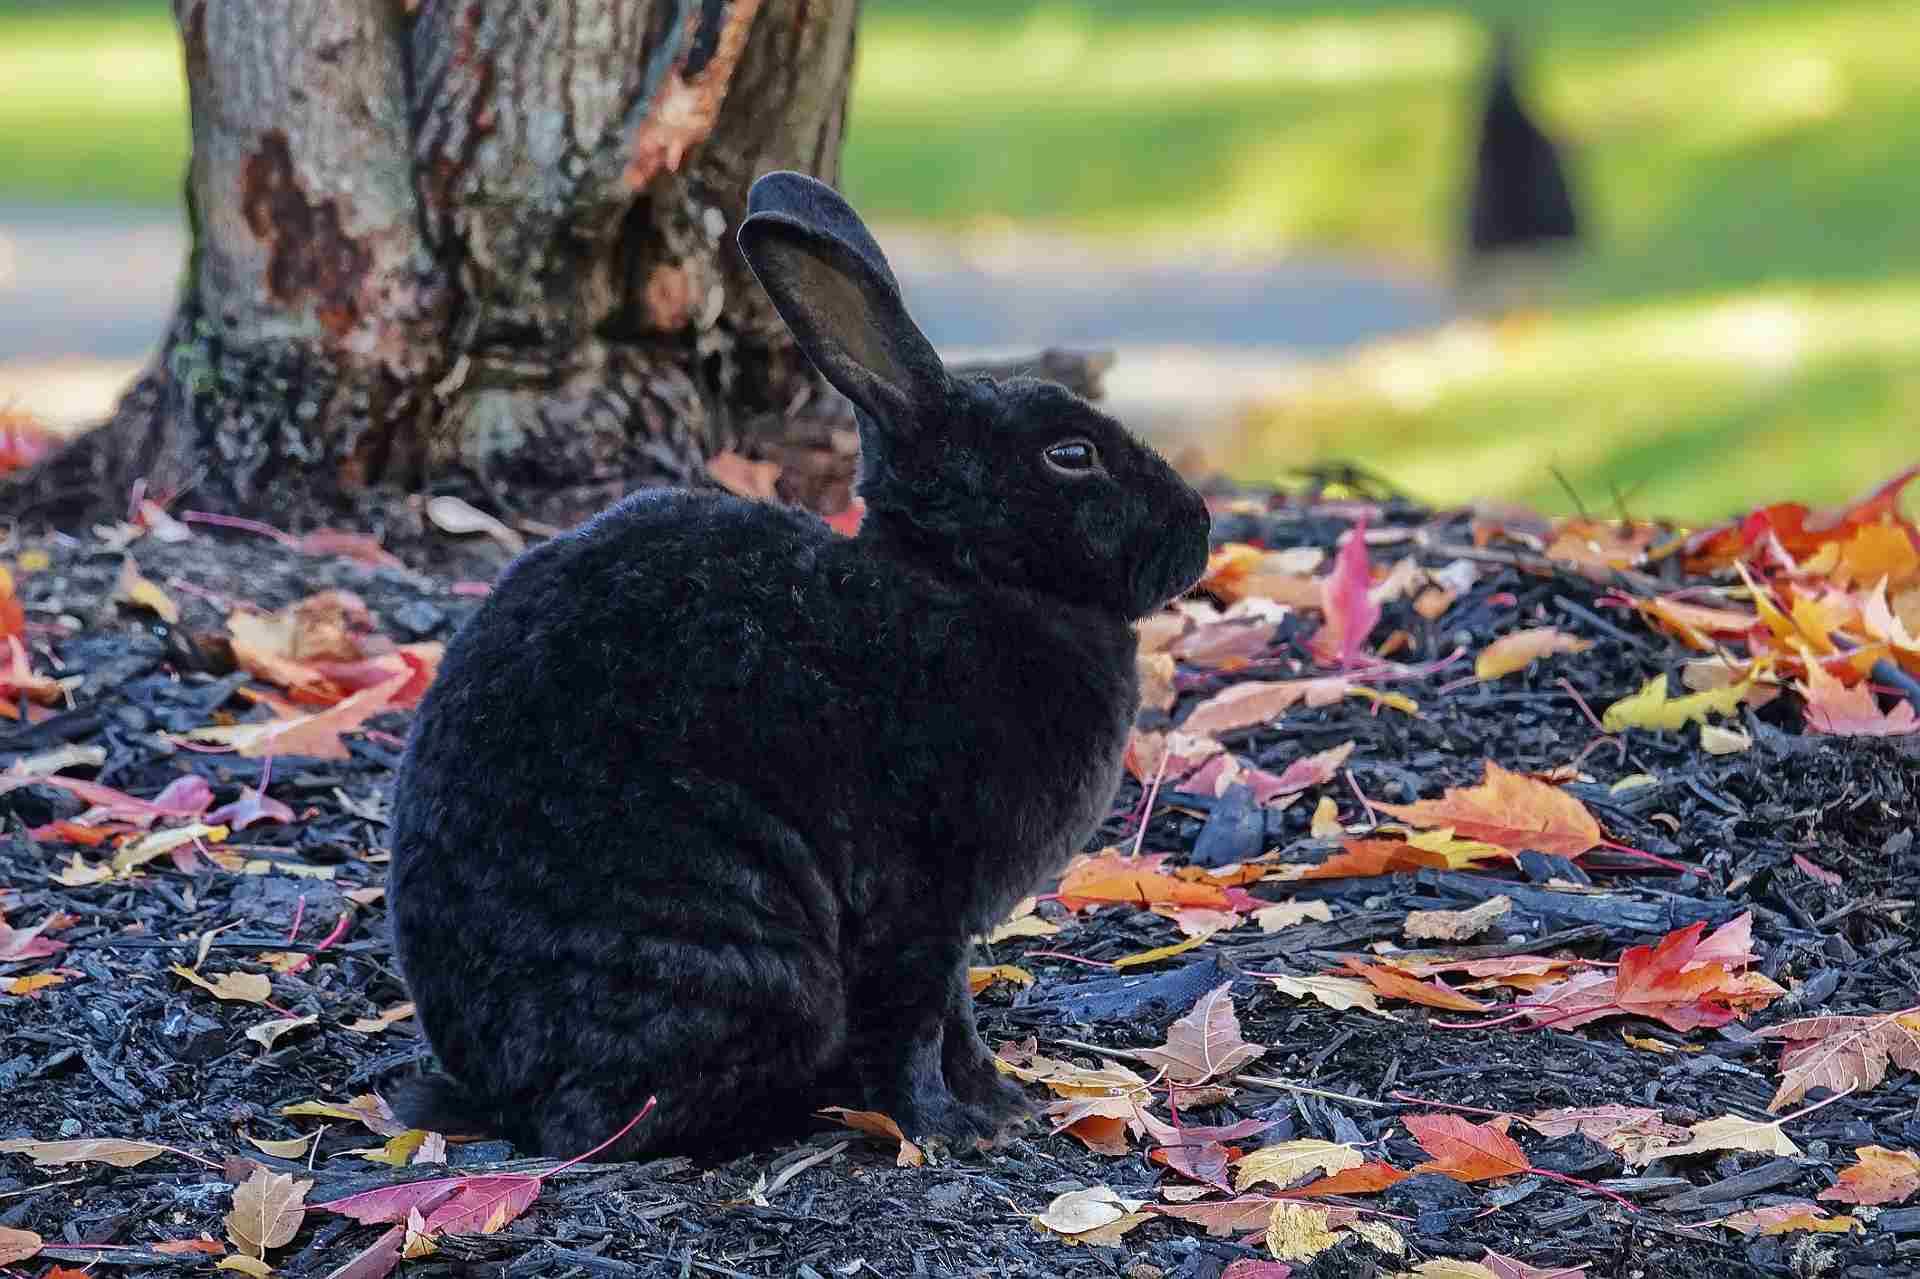 Black rabbit in an autumn landscape.